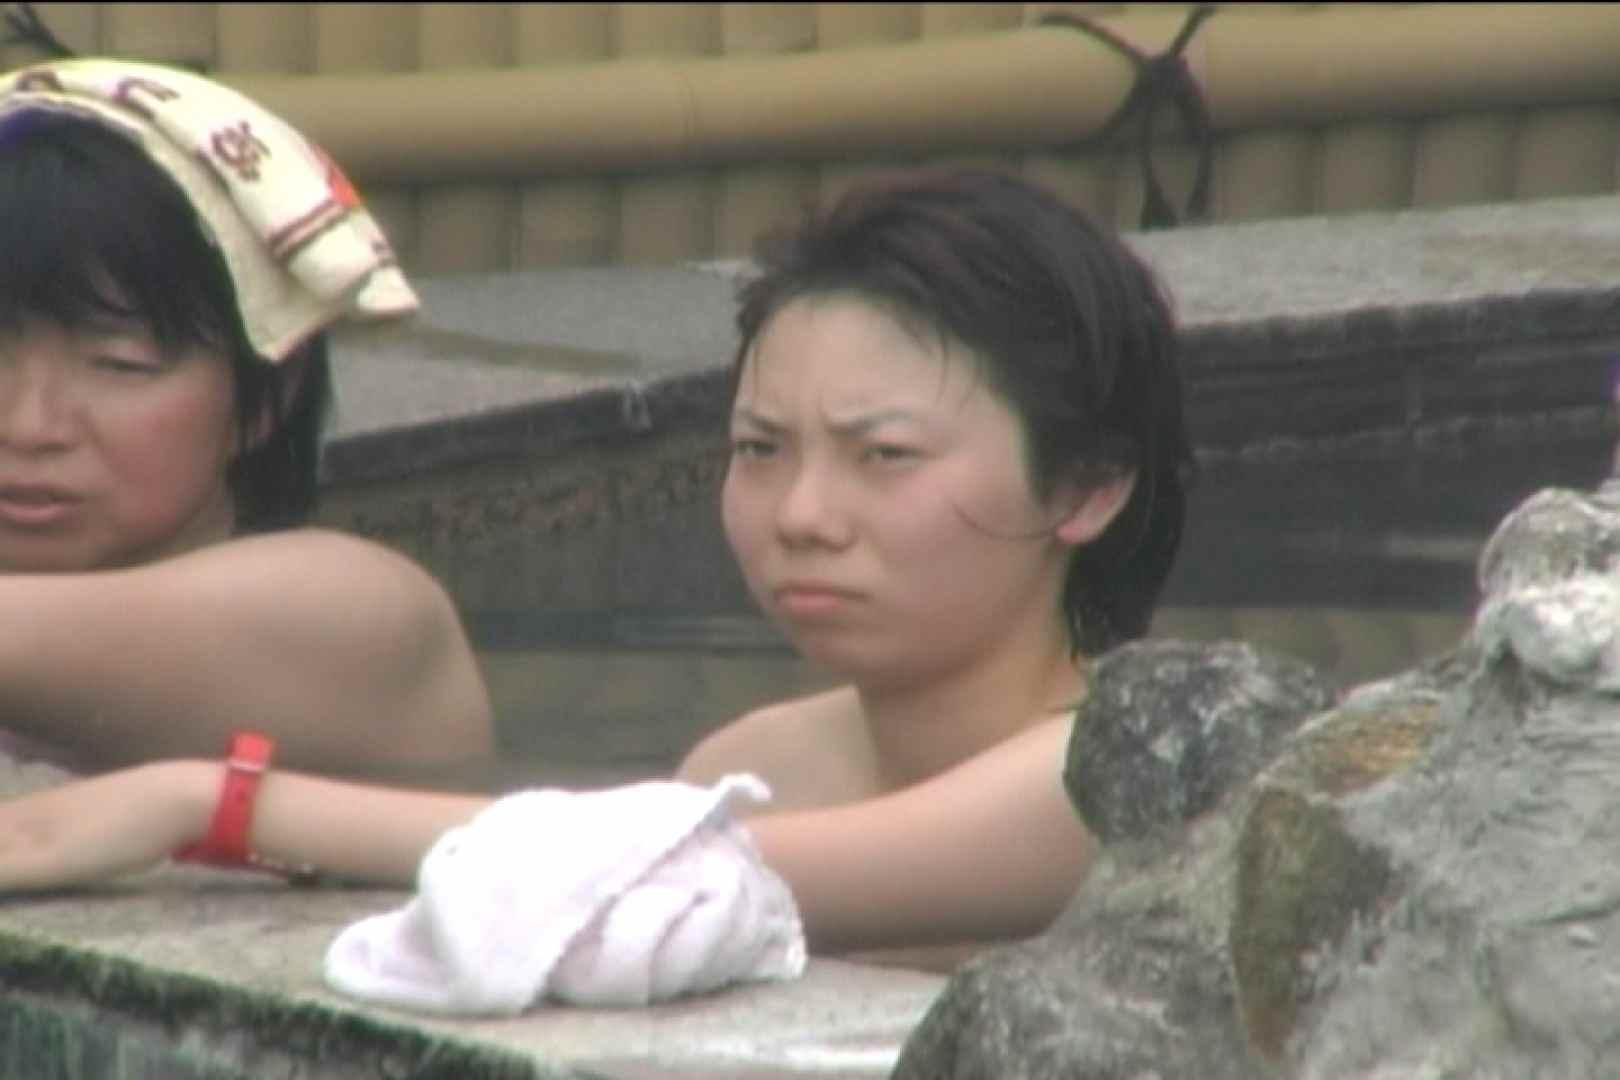 Aquaな露天風呂Vol.122 露天風呂編 | 盗撮シリーズ  92PIX 15